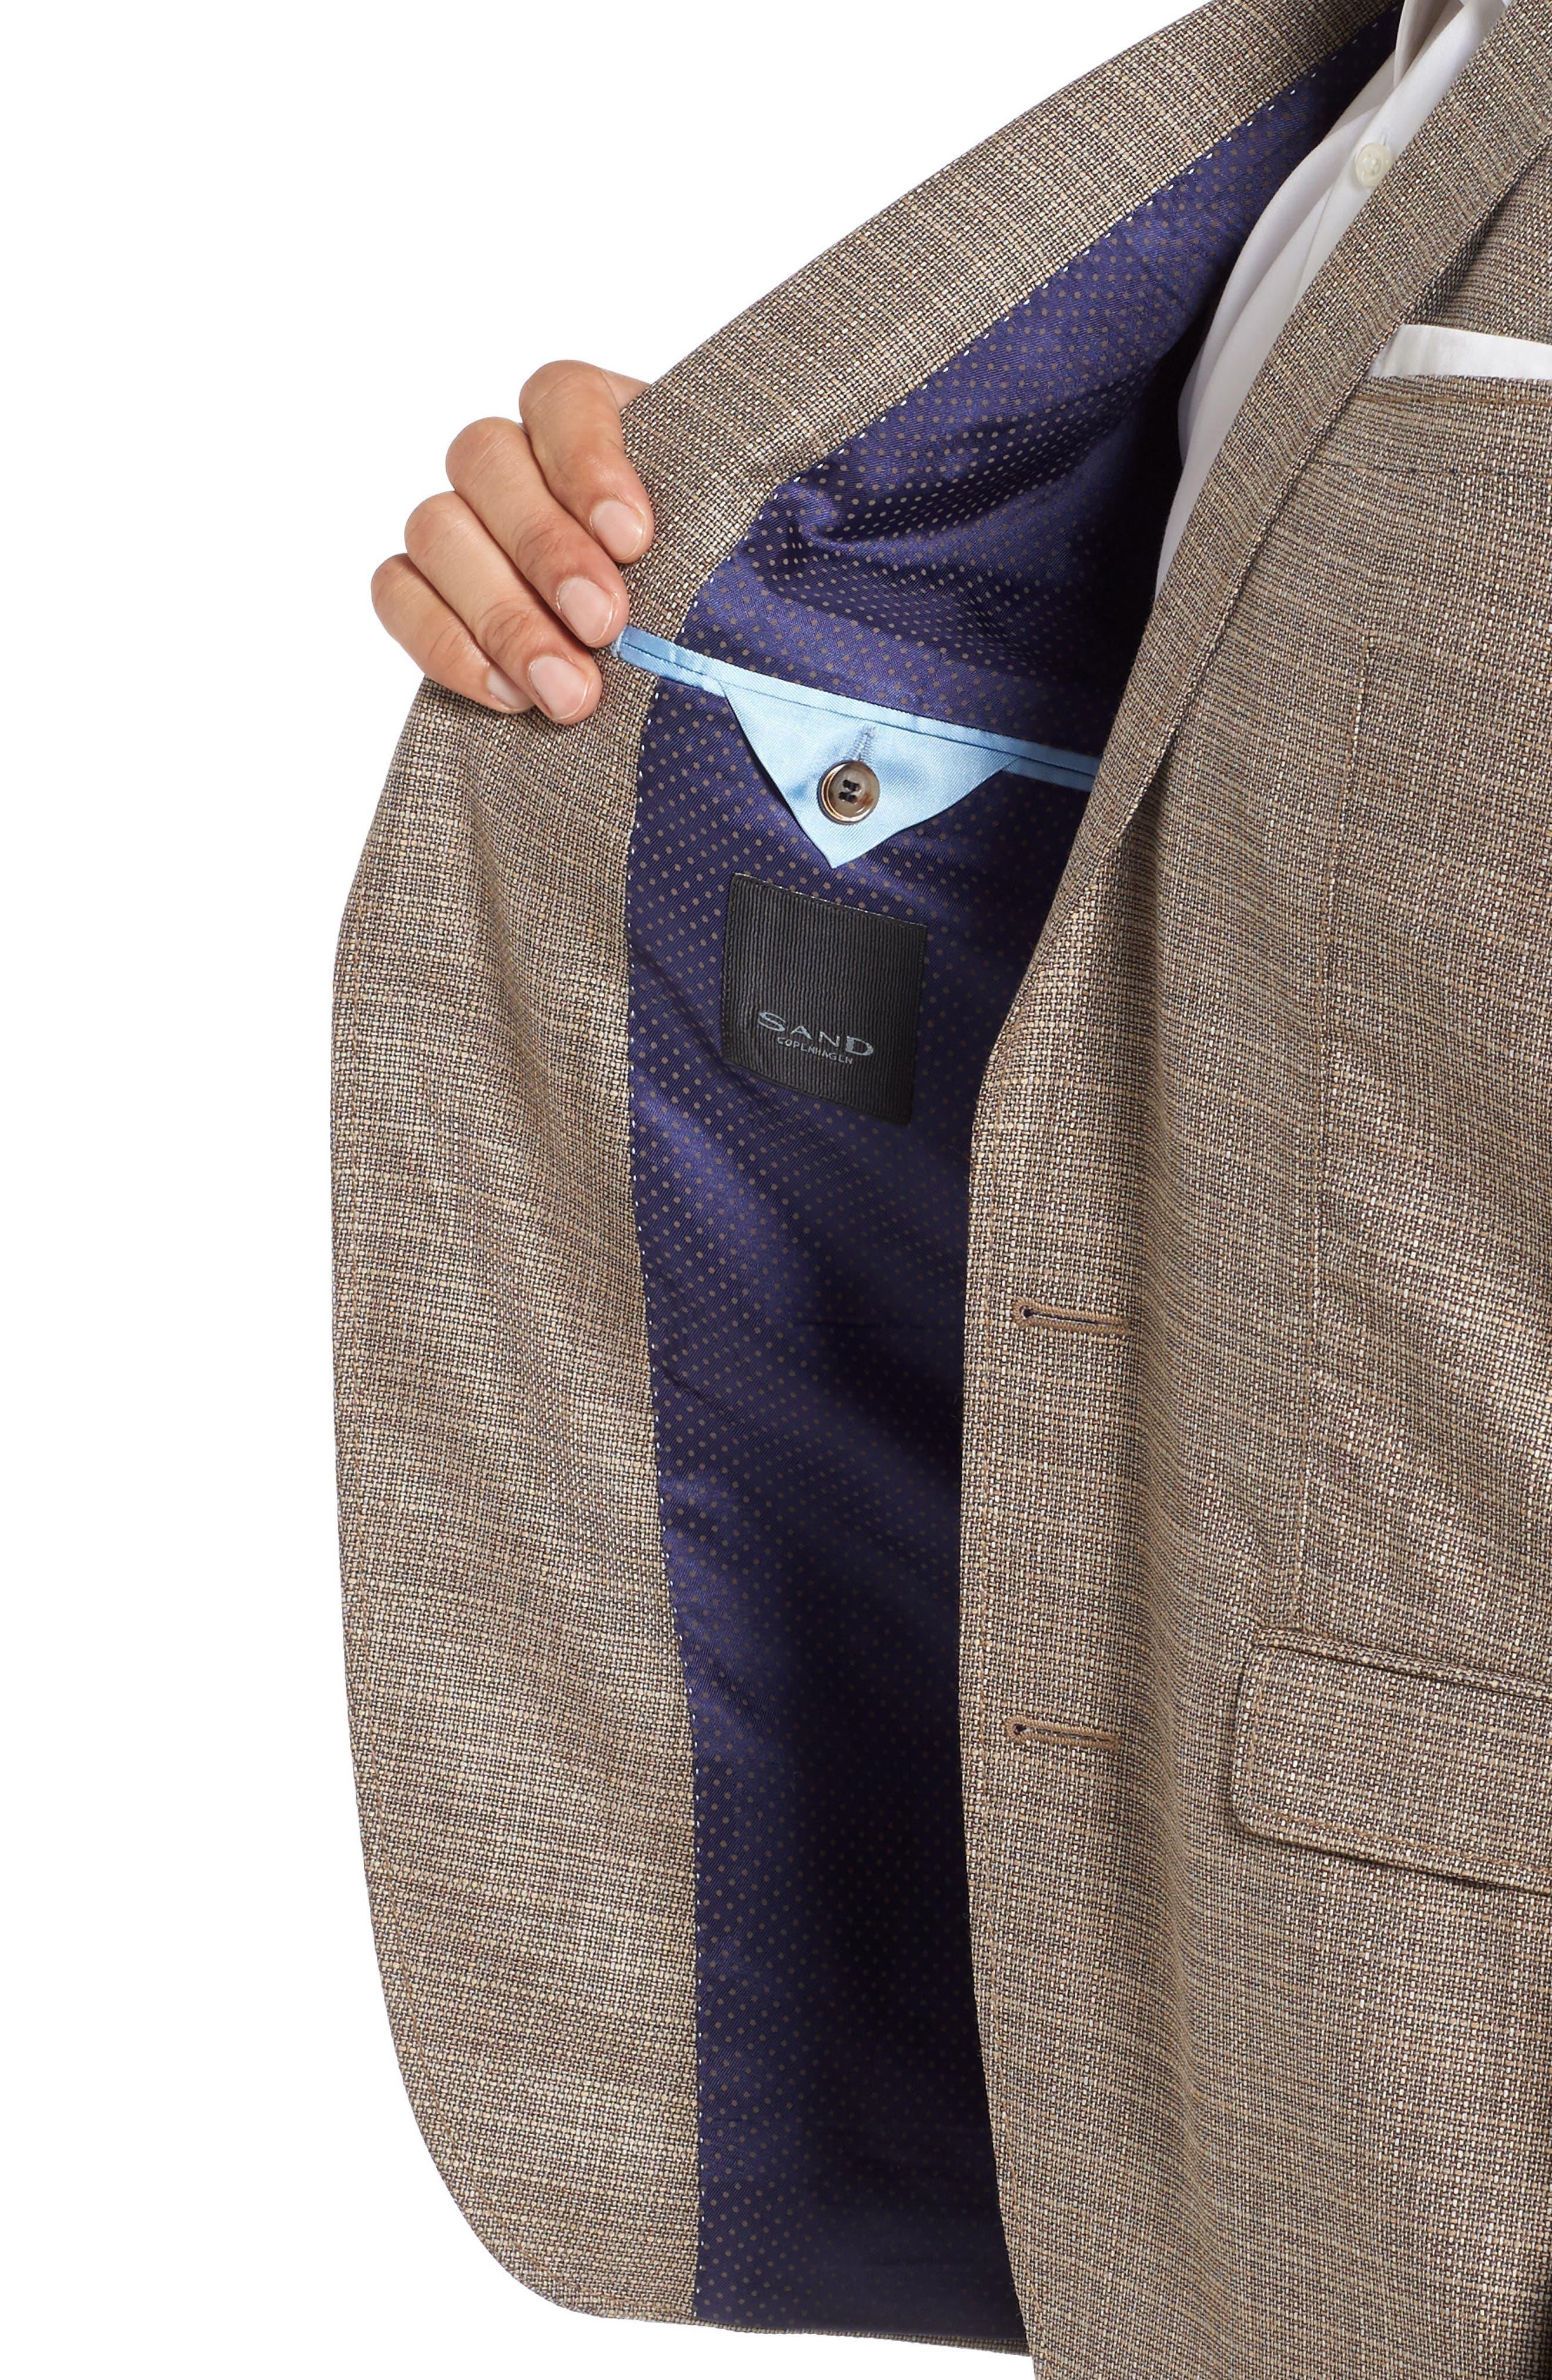 Trim Fit Wool Blazer,                             Alternate thumbnail 4, color,                             271